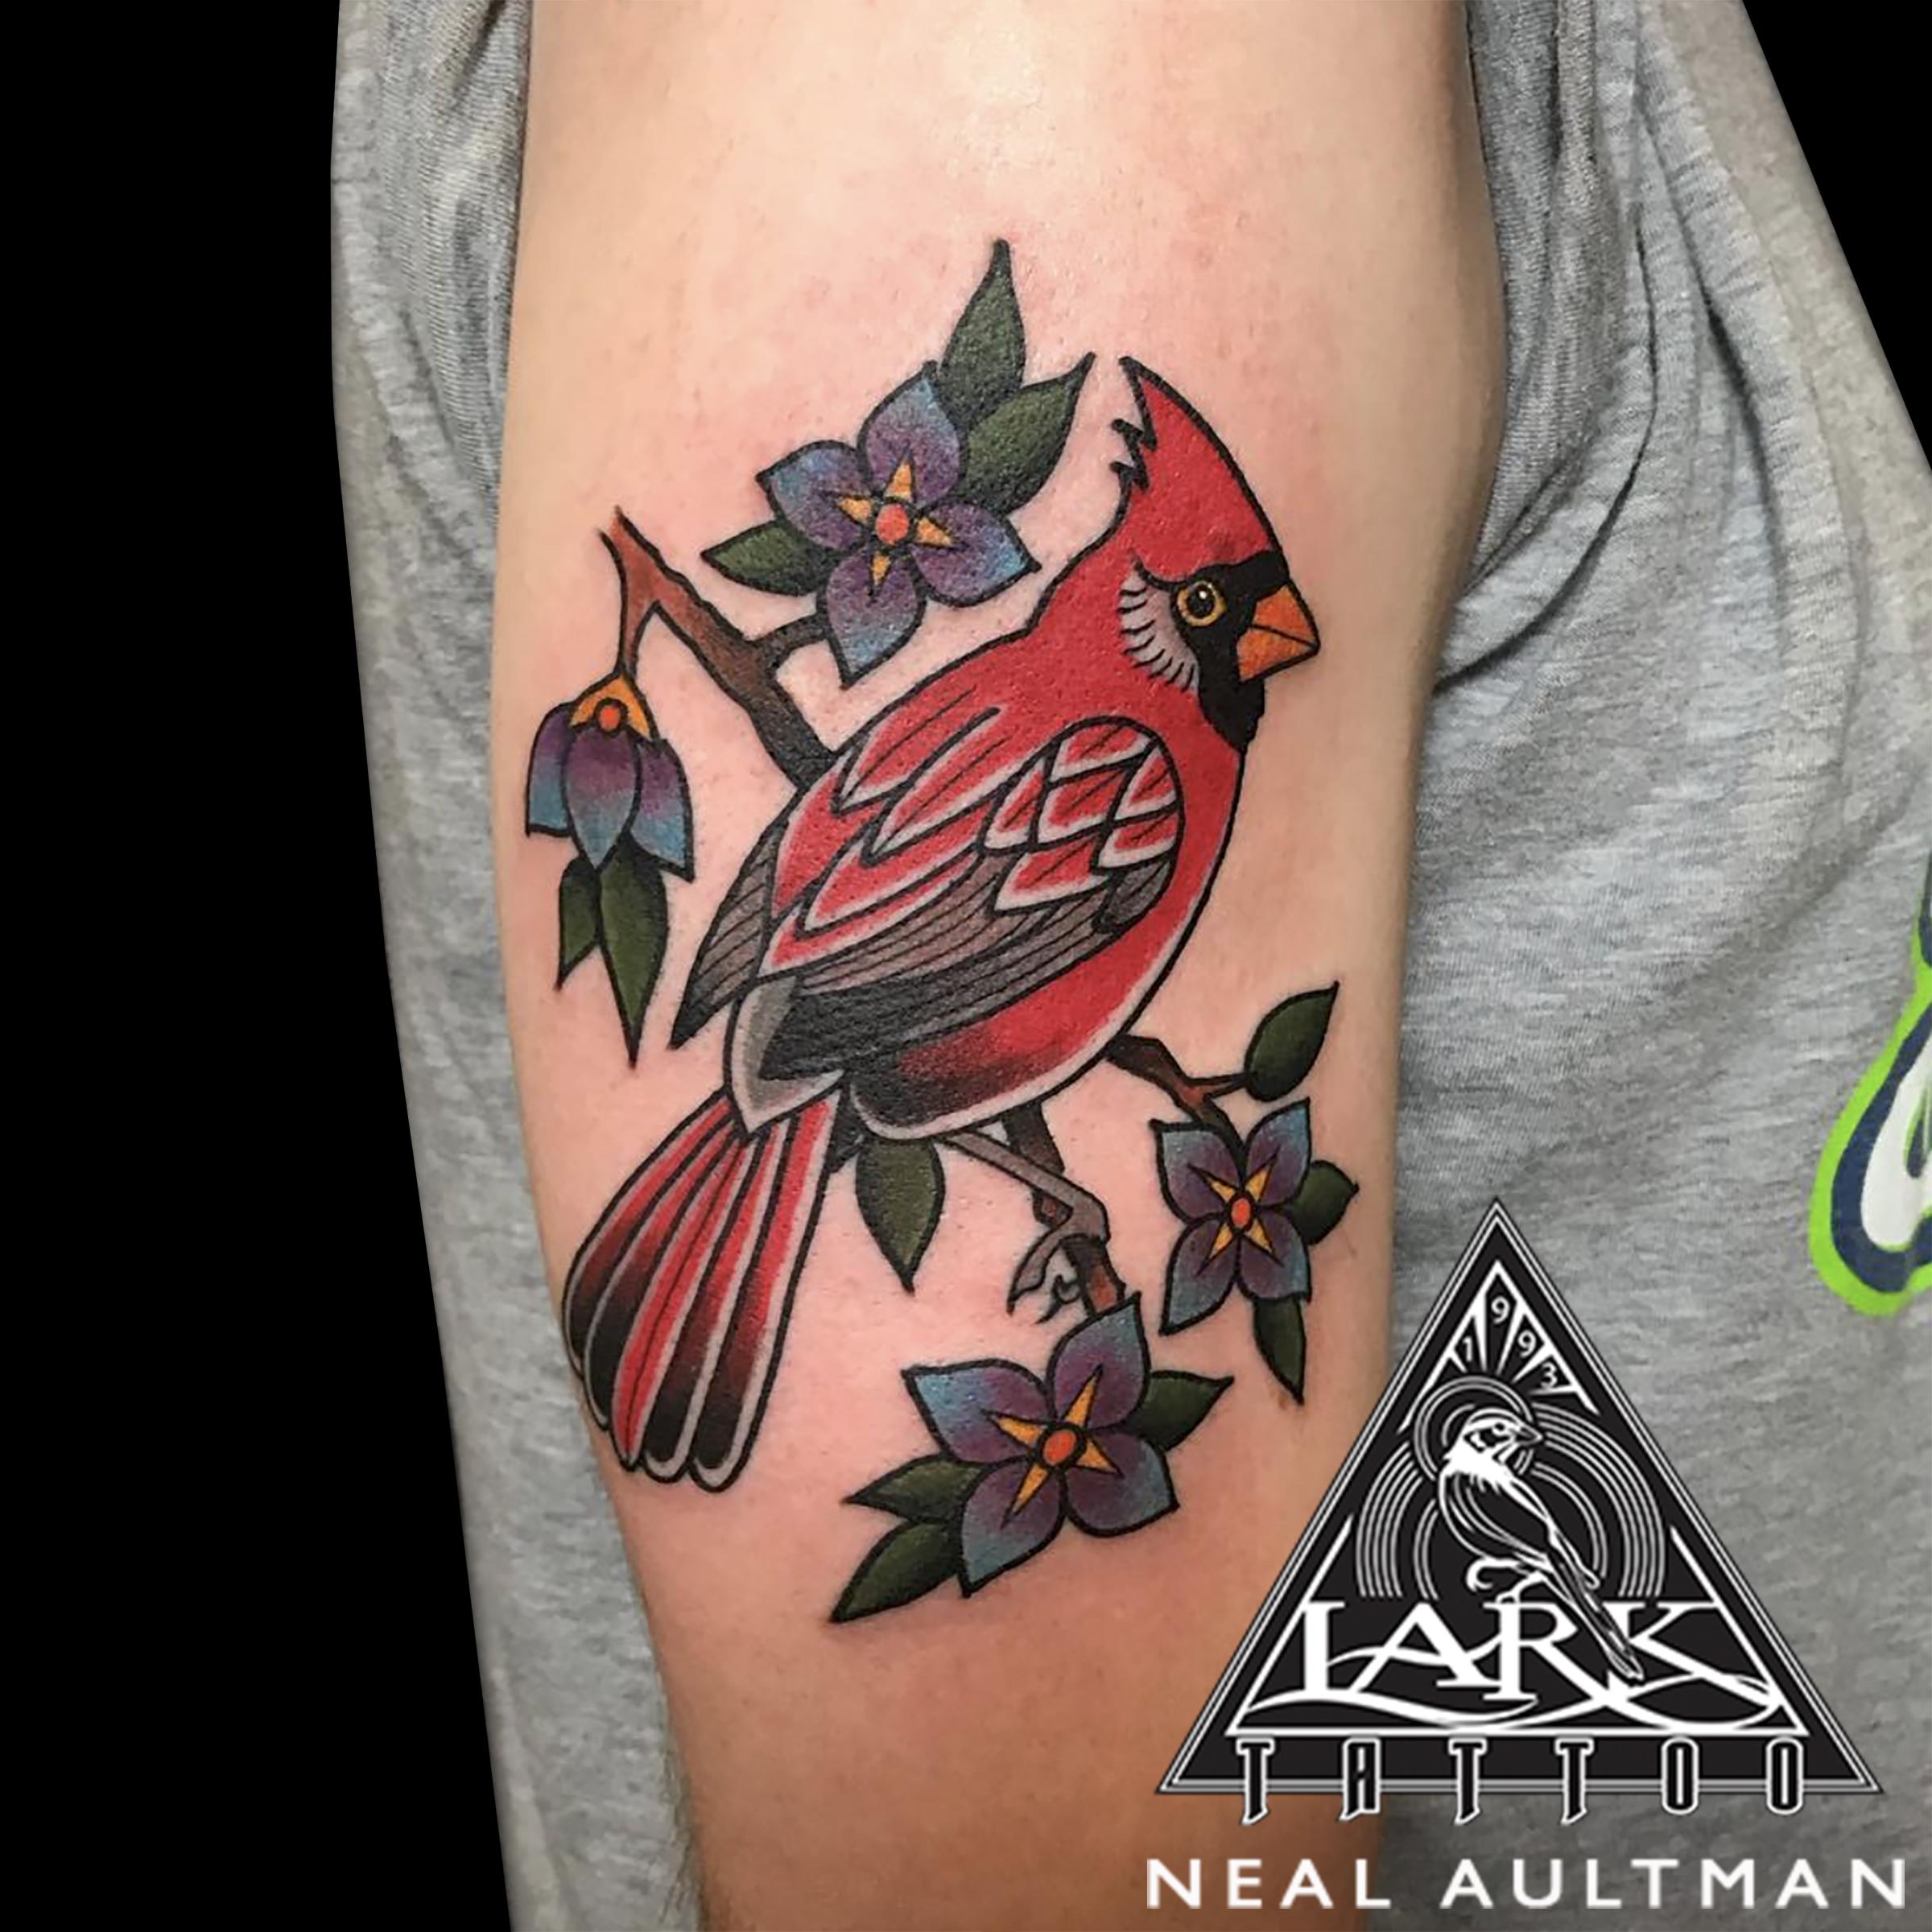 color, colortattoo, bird, birdtattoo, traditional, traditionaltattoo, cardinal, cardinaltattoo, cardinalbird, traditionalcardinal, traditionalcardinaltattoo, tattoo, tattoos, tat, tats, tatts, tatted, tattedup, tattoist, tattooed, inked, inkedup, ink, tattoooftheday, amazingink, bodyart, tattooig, tattoosofinstagram, instatats , larktattoo, larktattoos, larktattoowestbury, westbury, longisland, NY, NewYork, usa, art, neal, aultman, nealaultman